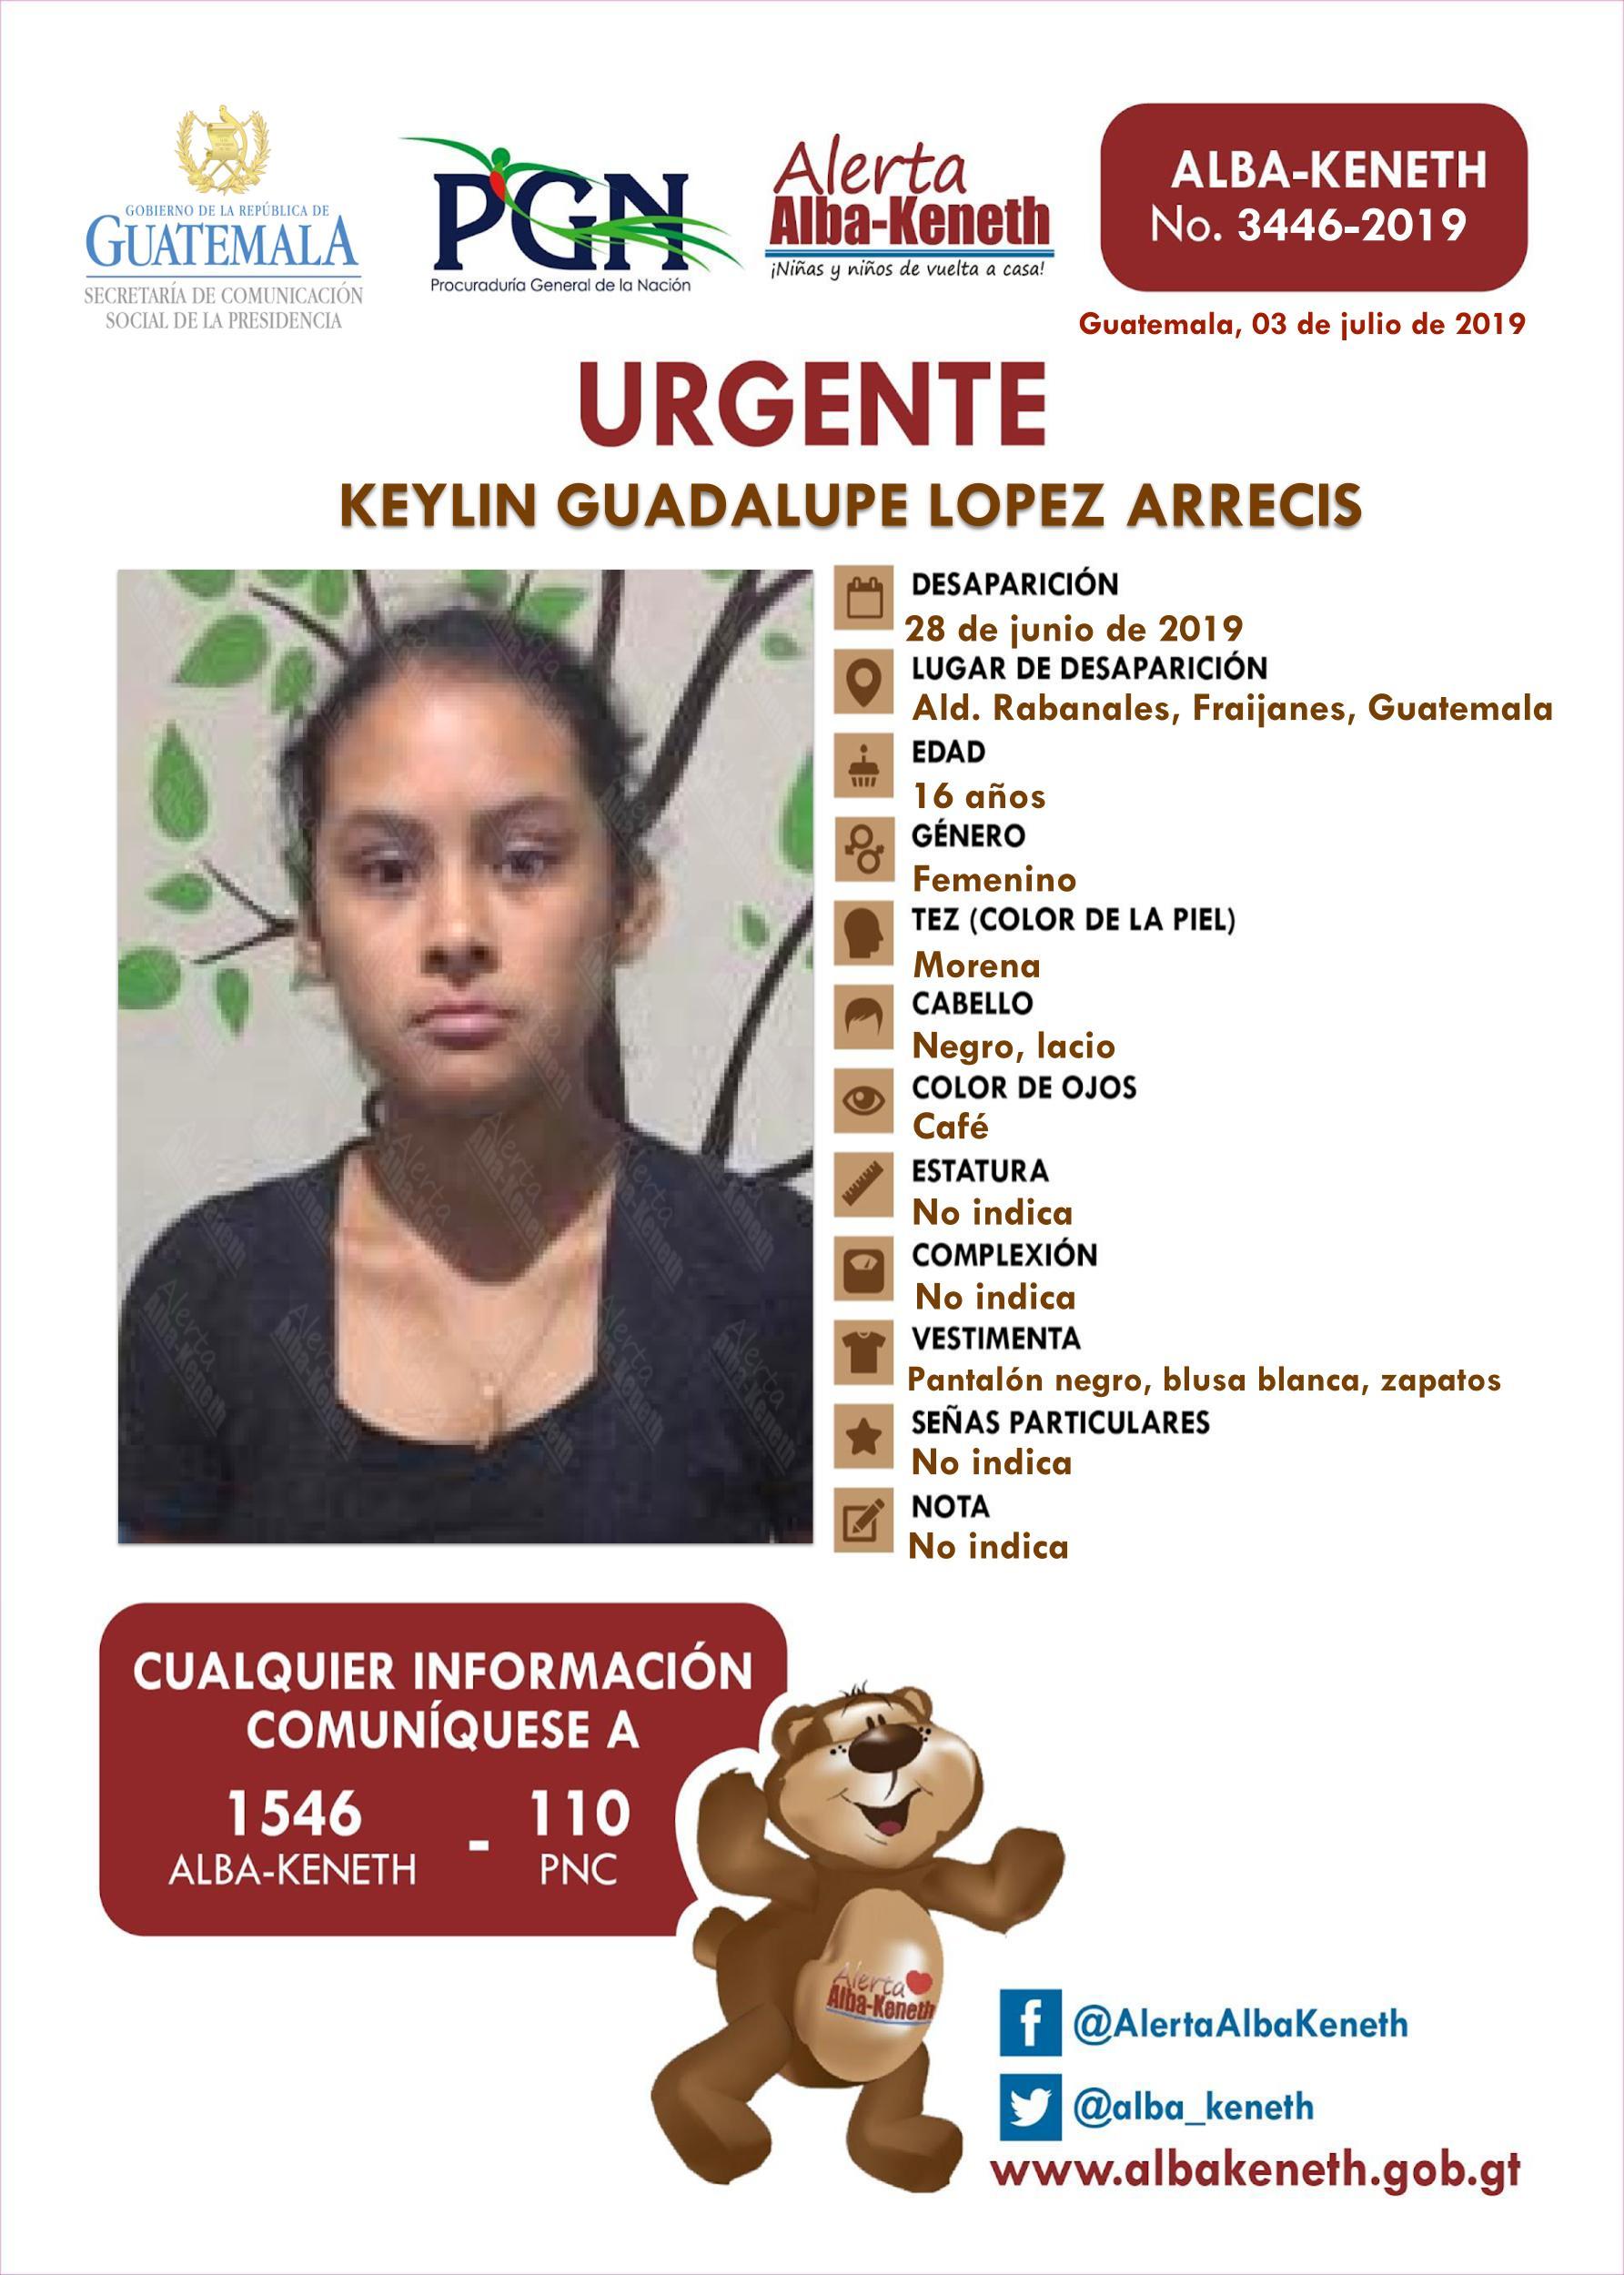 Keylin Guadalupe Lopez Arrecis